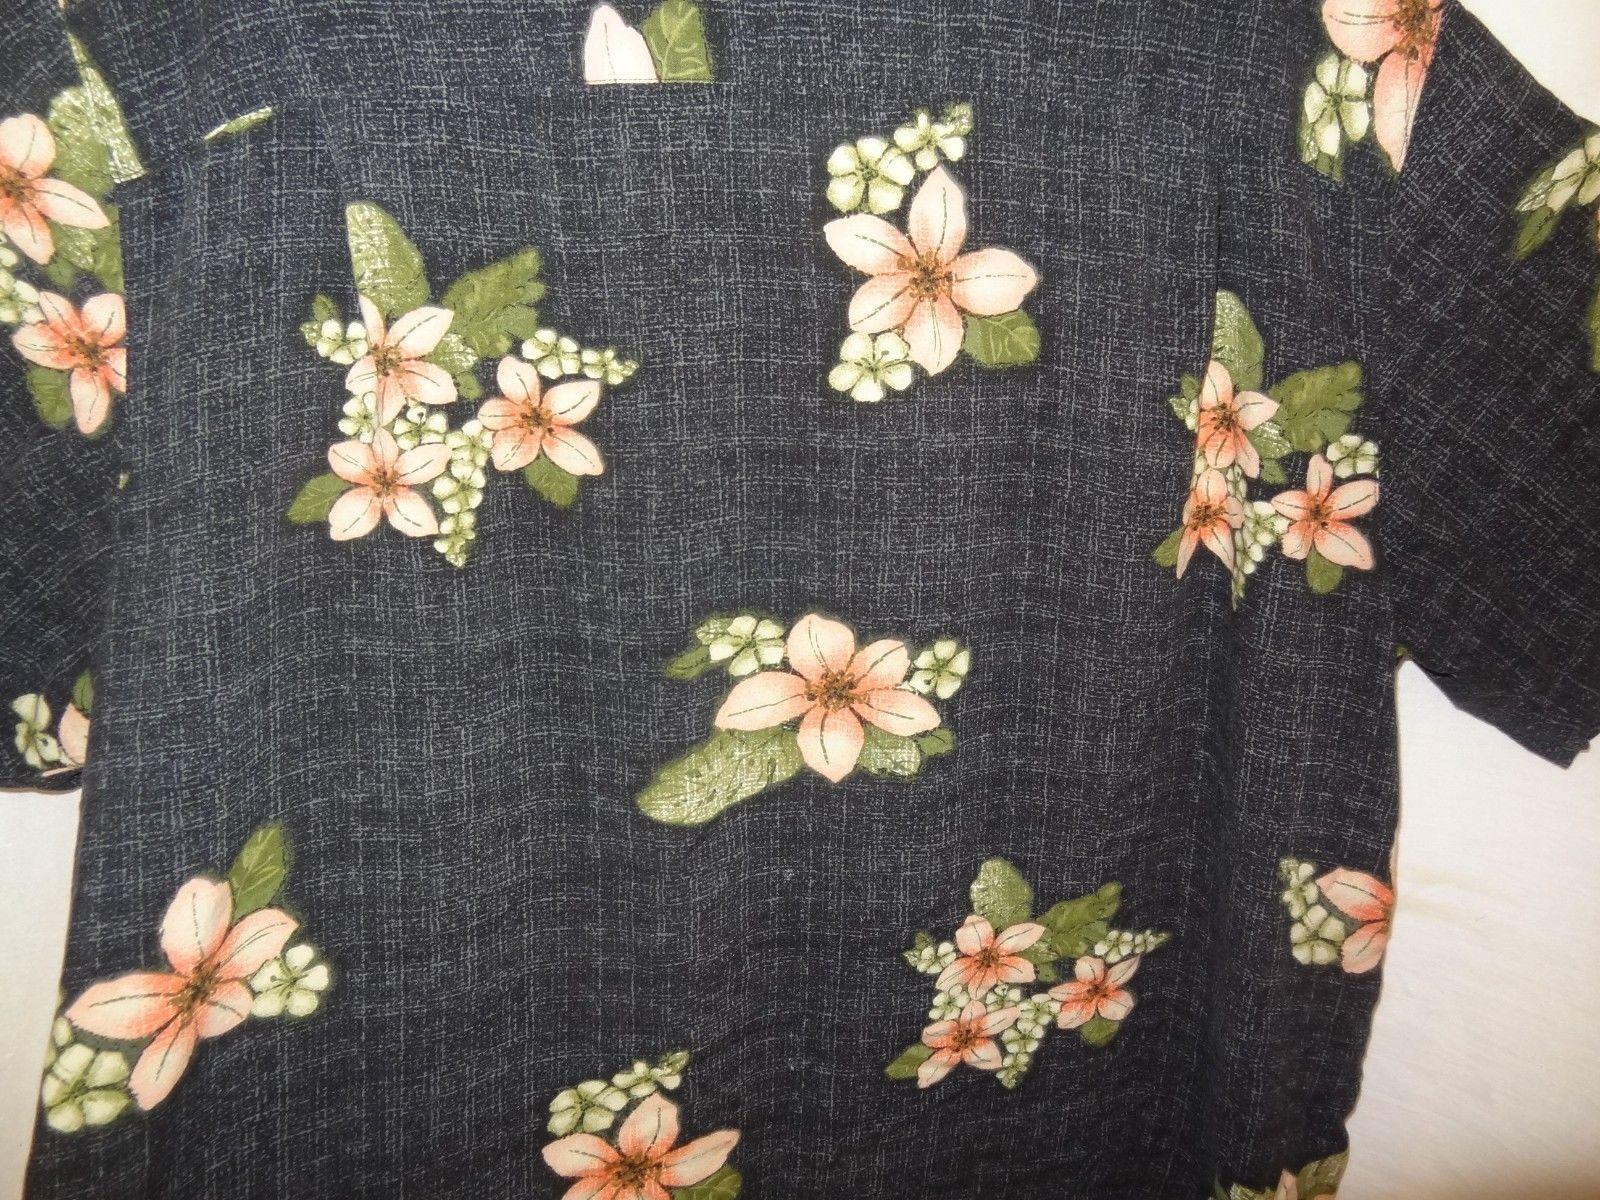 2dc0f425f Aloha Hawaiian Shirt Flowers Leaves Plaid Size 3XL 54 to 56 Black Pink  Puritan